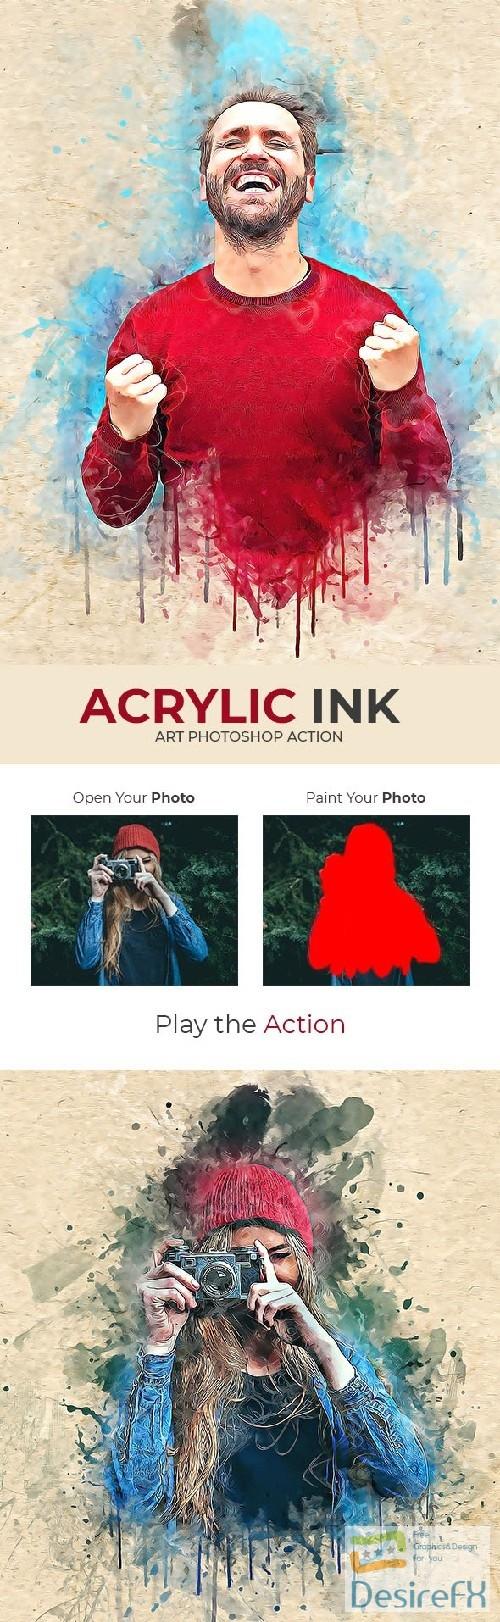 Acrylic Ink Art Photoshop Action 22336615